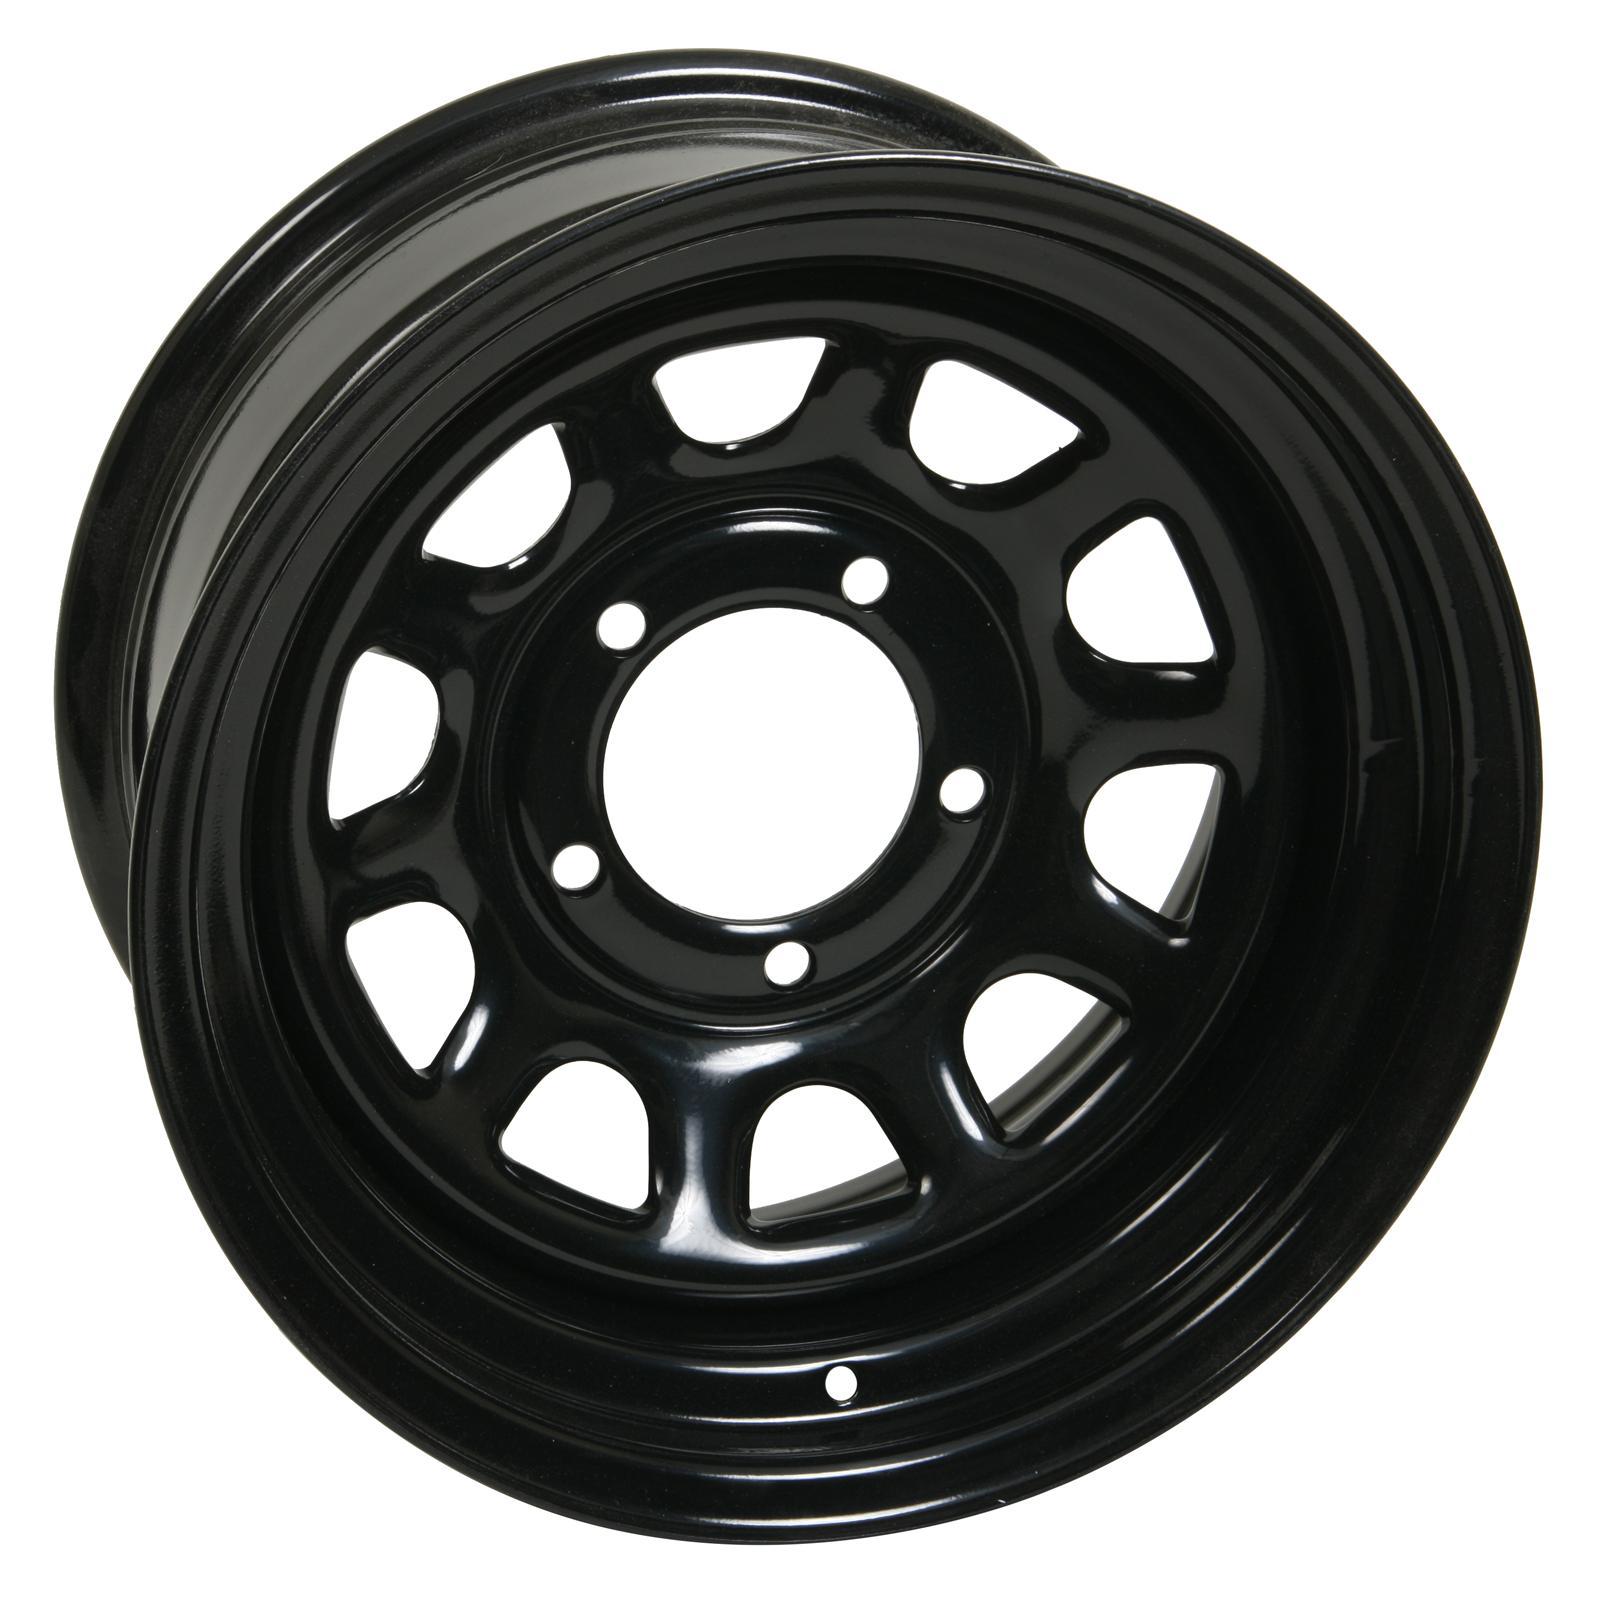 Vision hd 84 d window series black wheels 84h5865ns6 for 17 inch d window wheels